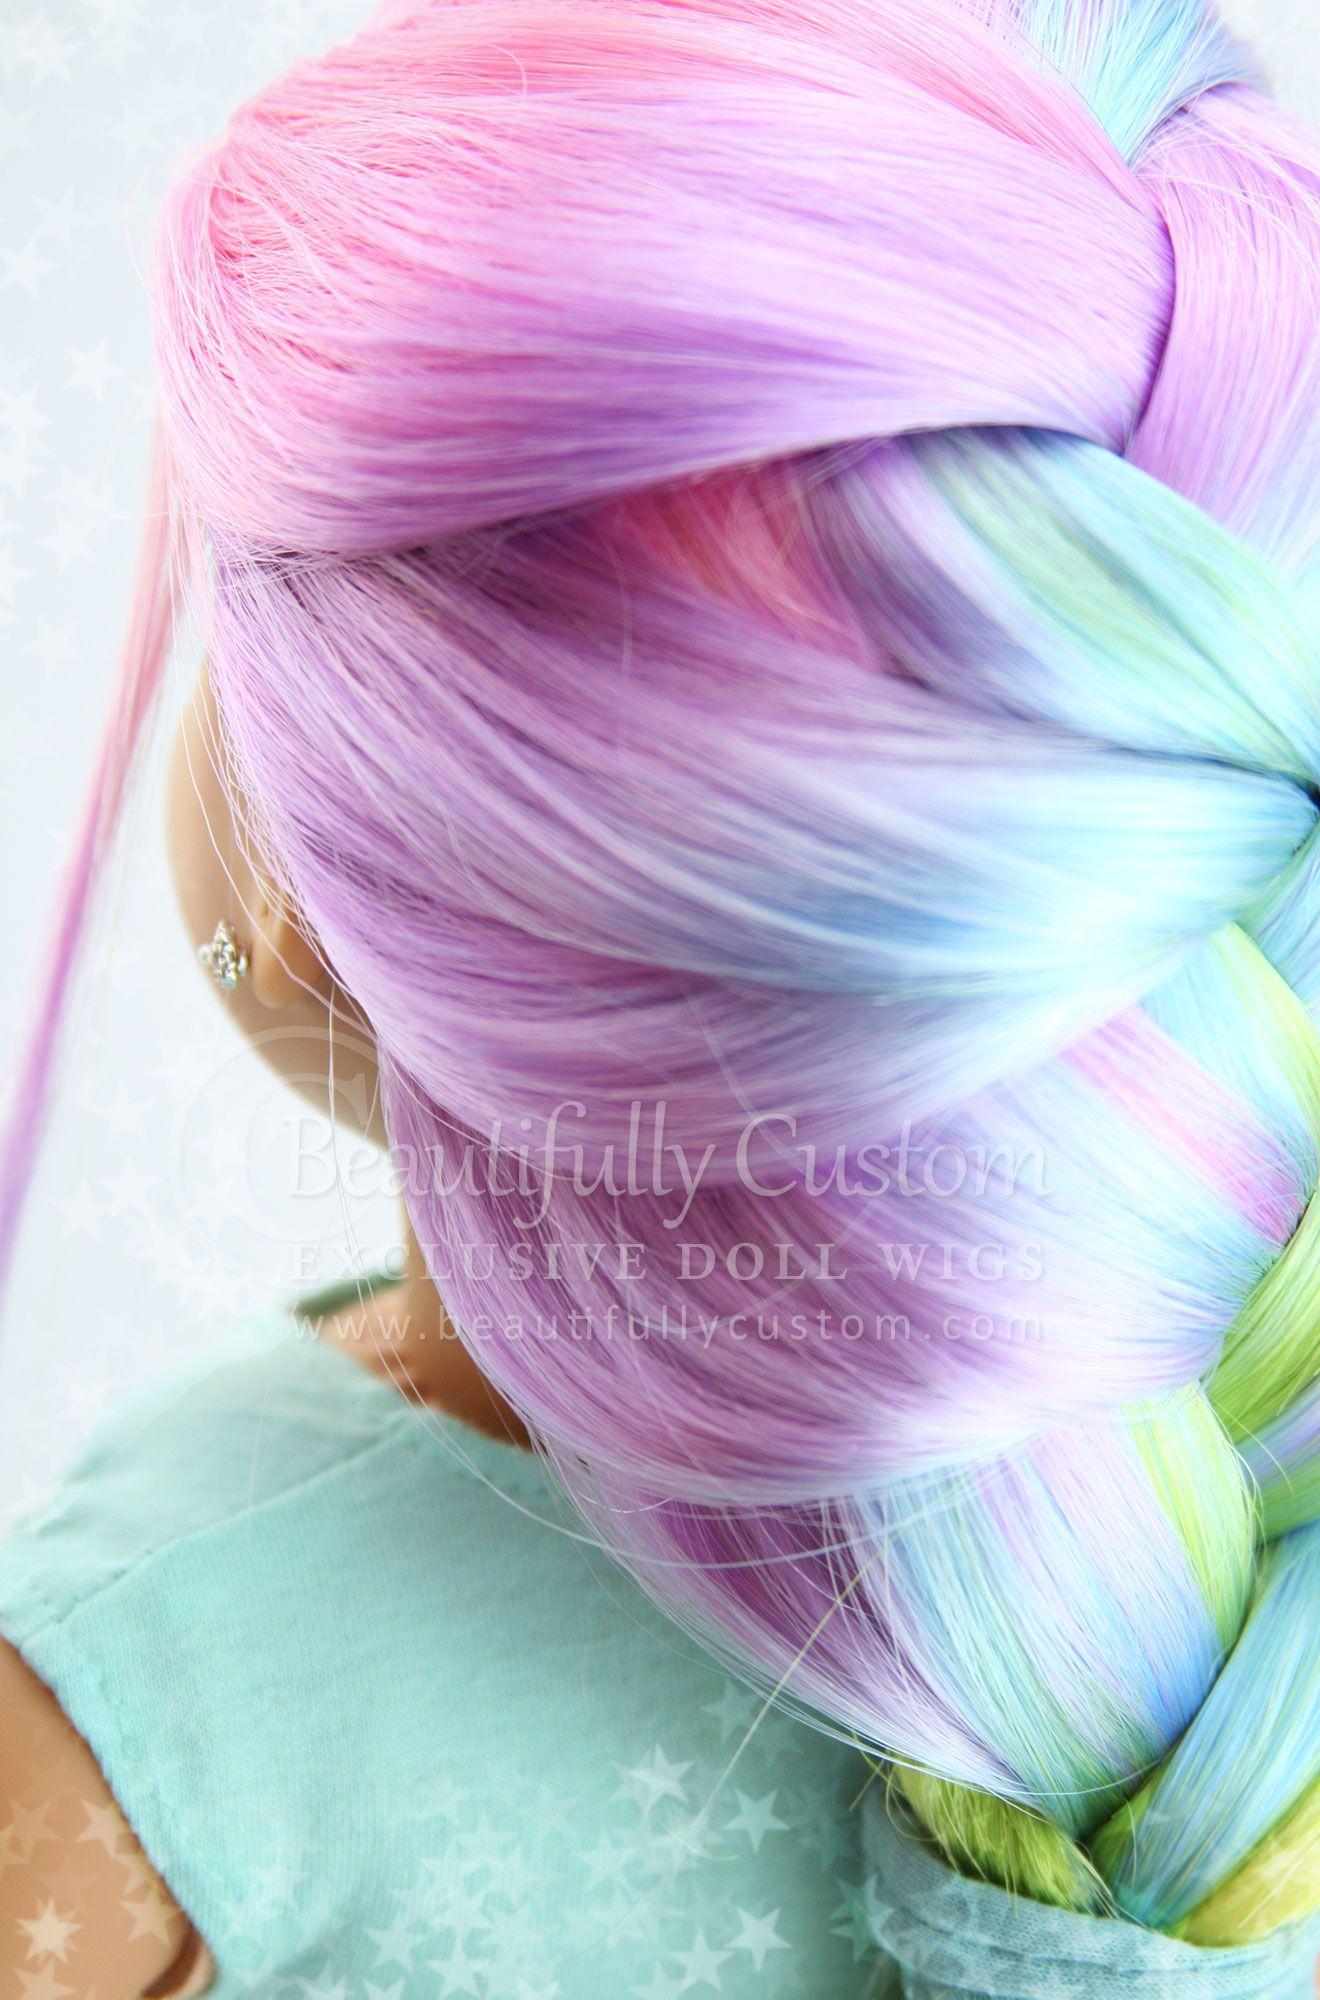 Pretty Pastel Elegance Doll Wig For American Girl Dolls Beautifully Custom Exclusive